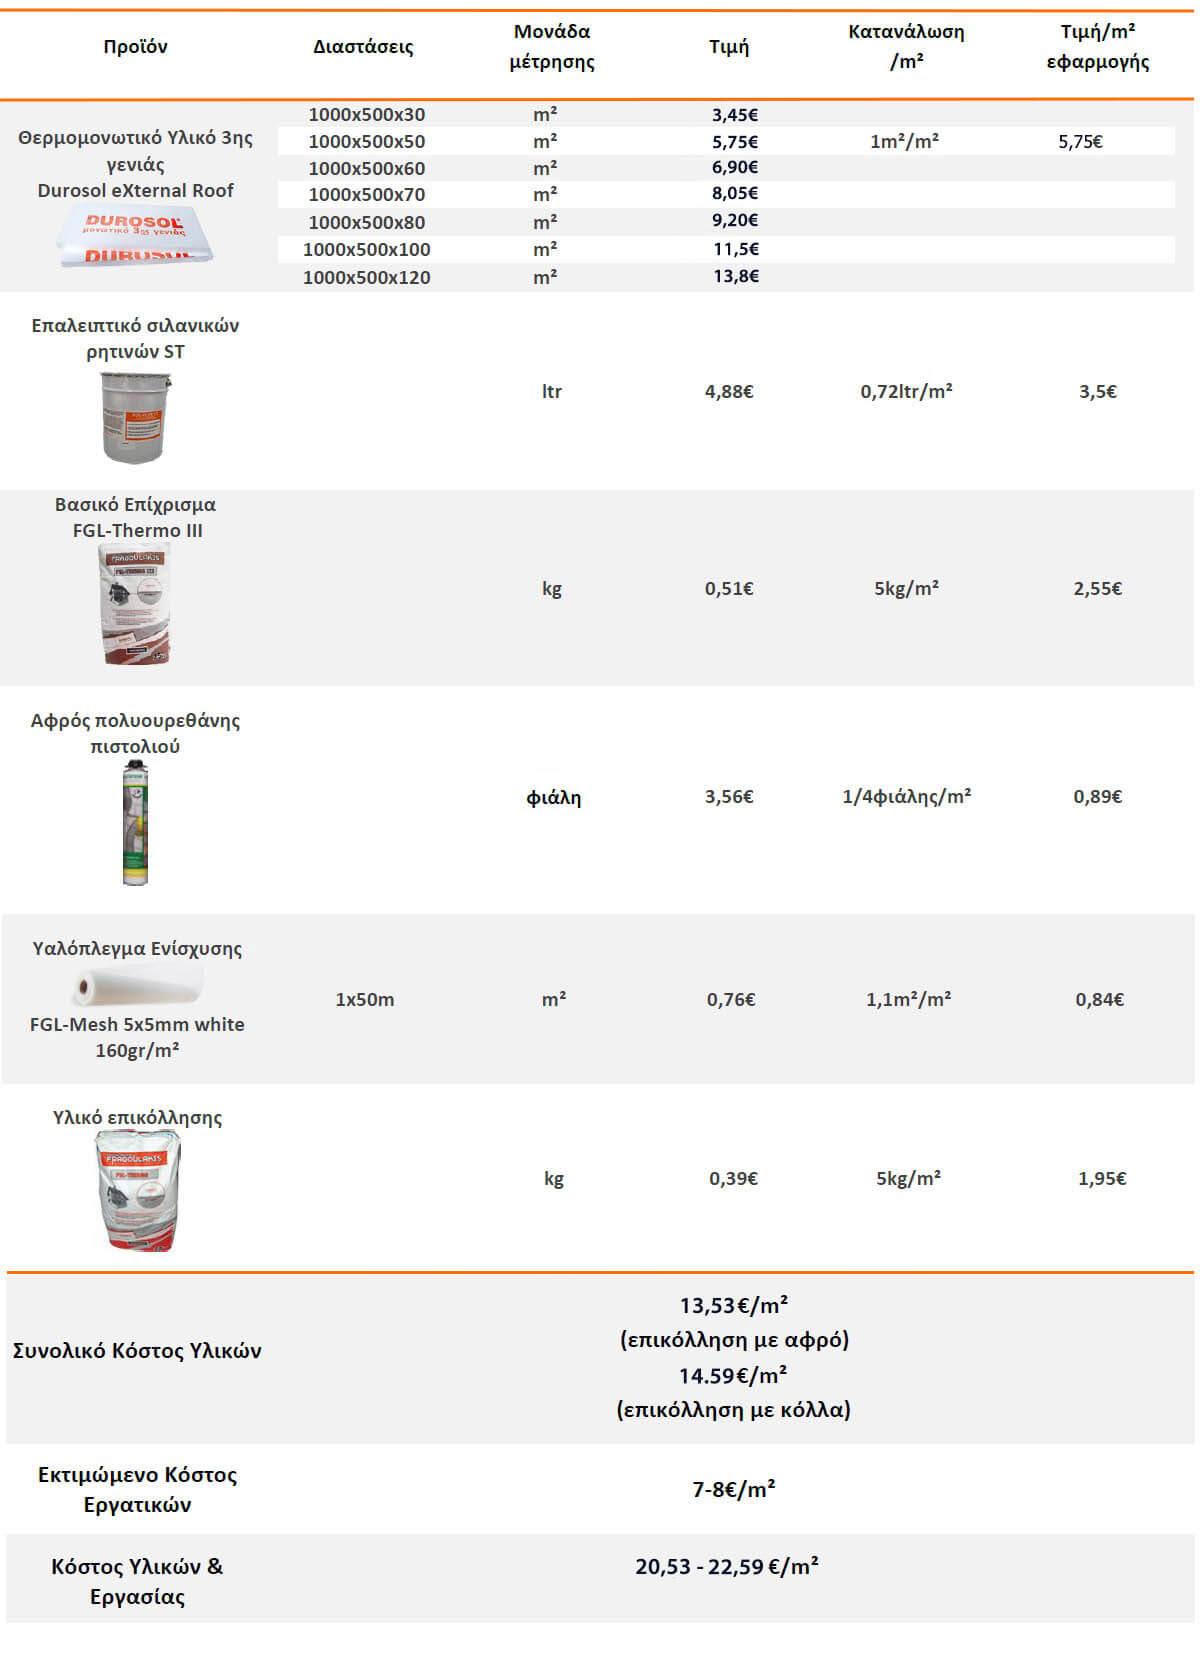 infographic τιμοκατάλογος για μονώσεις ταρατσών με το σύστημα για μόνωση light roof